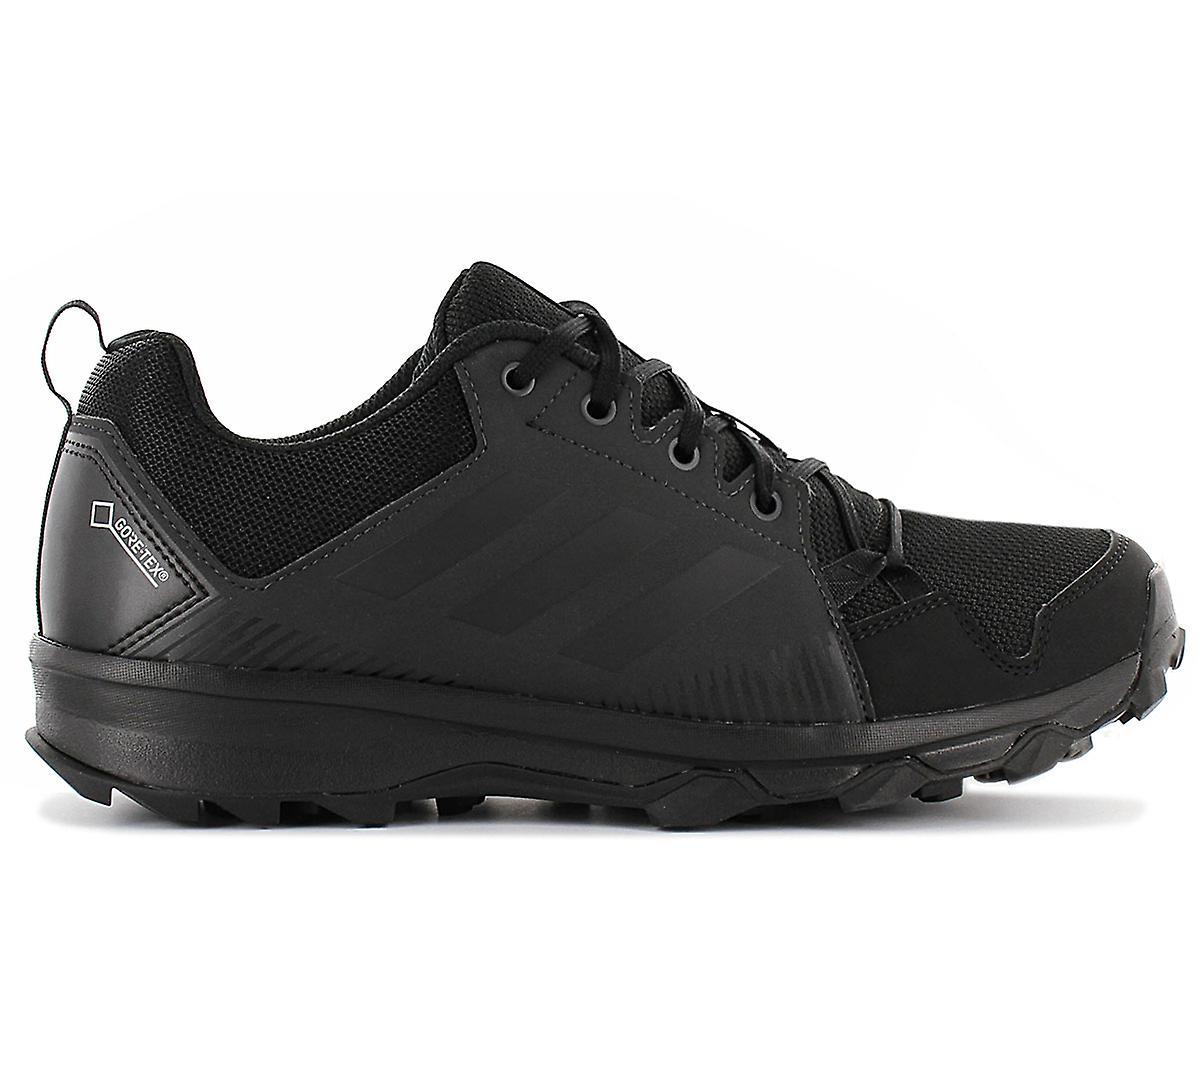 adidas Terrex Tracerocker GTX - Gore Tex - Chaussures de randonnée Hommes Noir CM7593 Sneakers Chaussures de sport